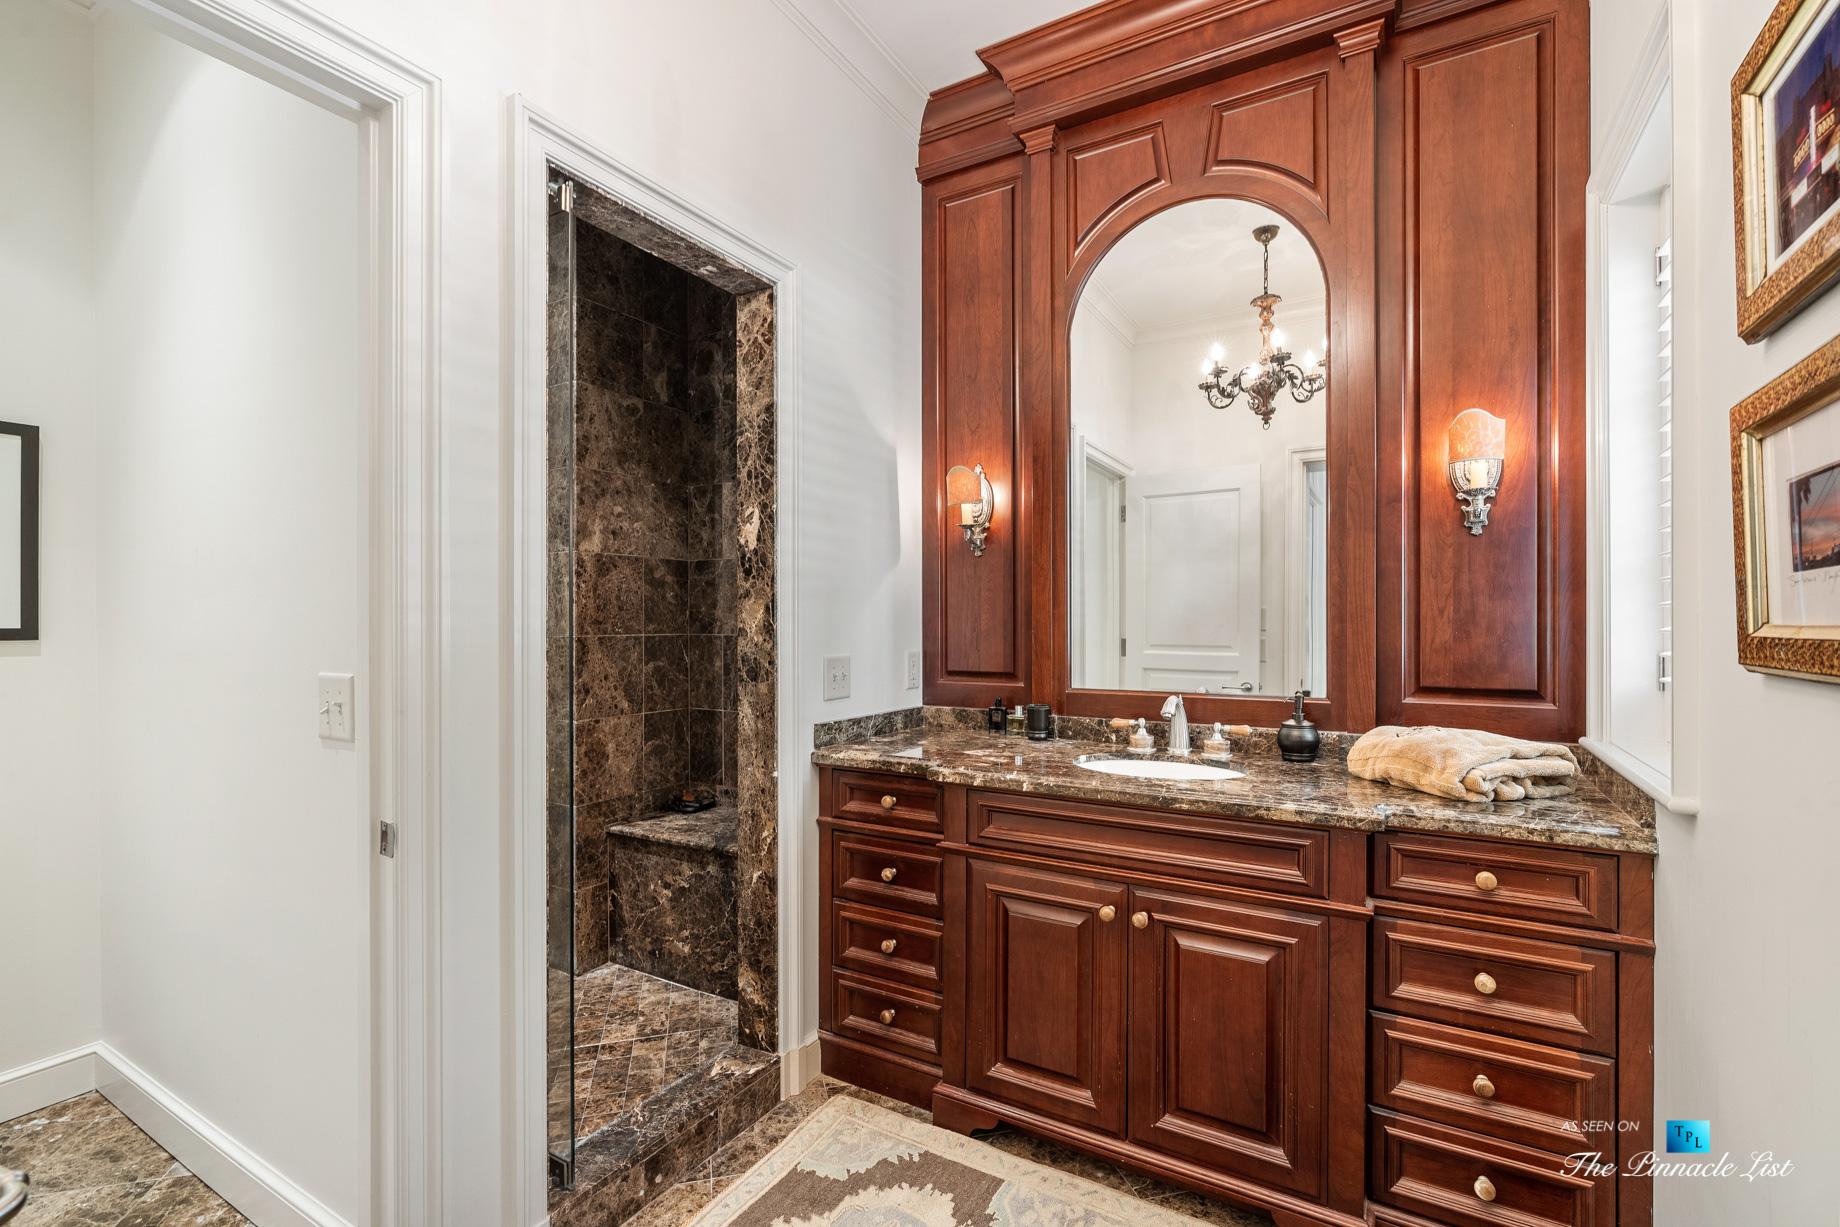 439 Blackland Rd NW, Atlanta, GA, USA - Bathroom with Shower - Luxury Real Estate - Tuxedo Park Mediterranean Mansion Home